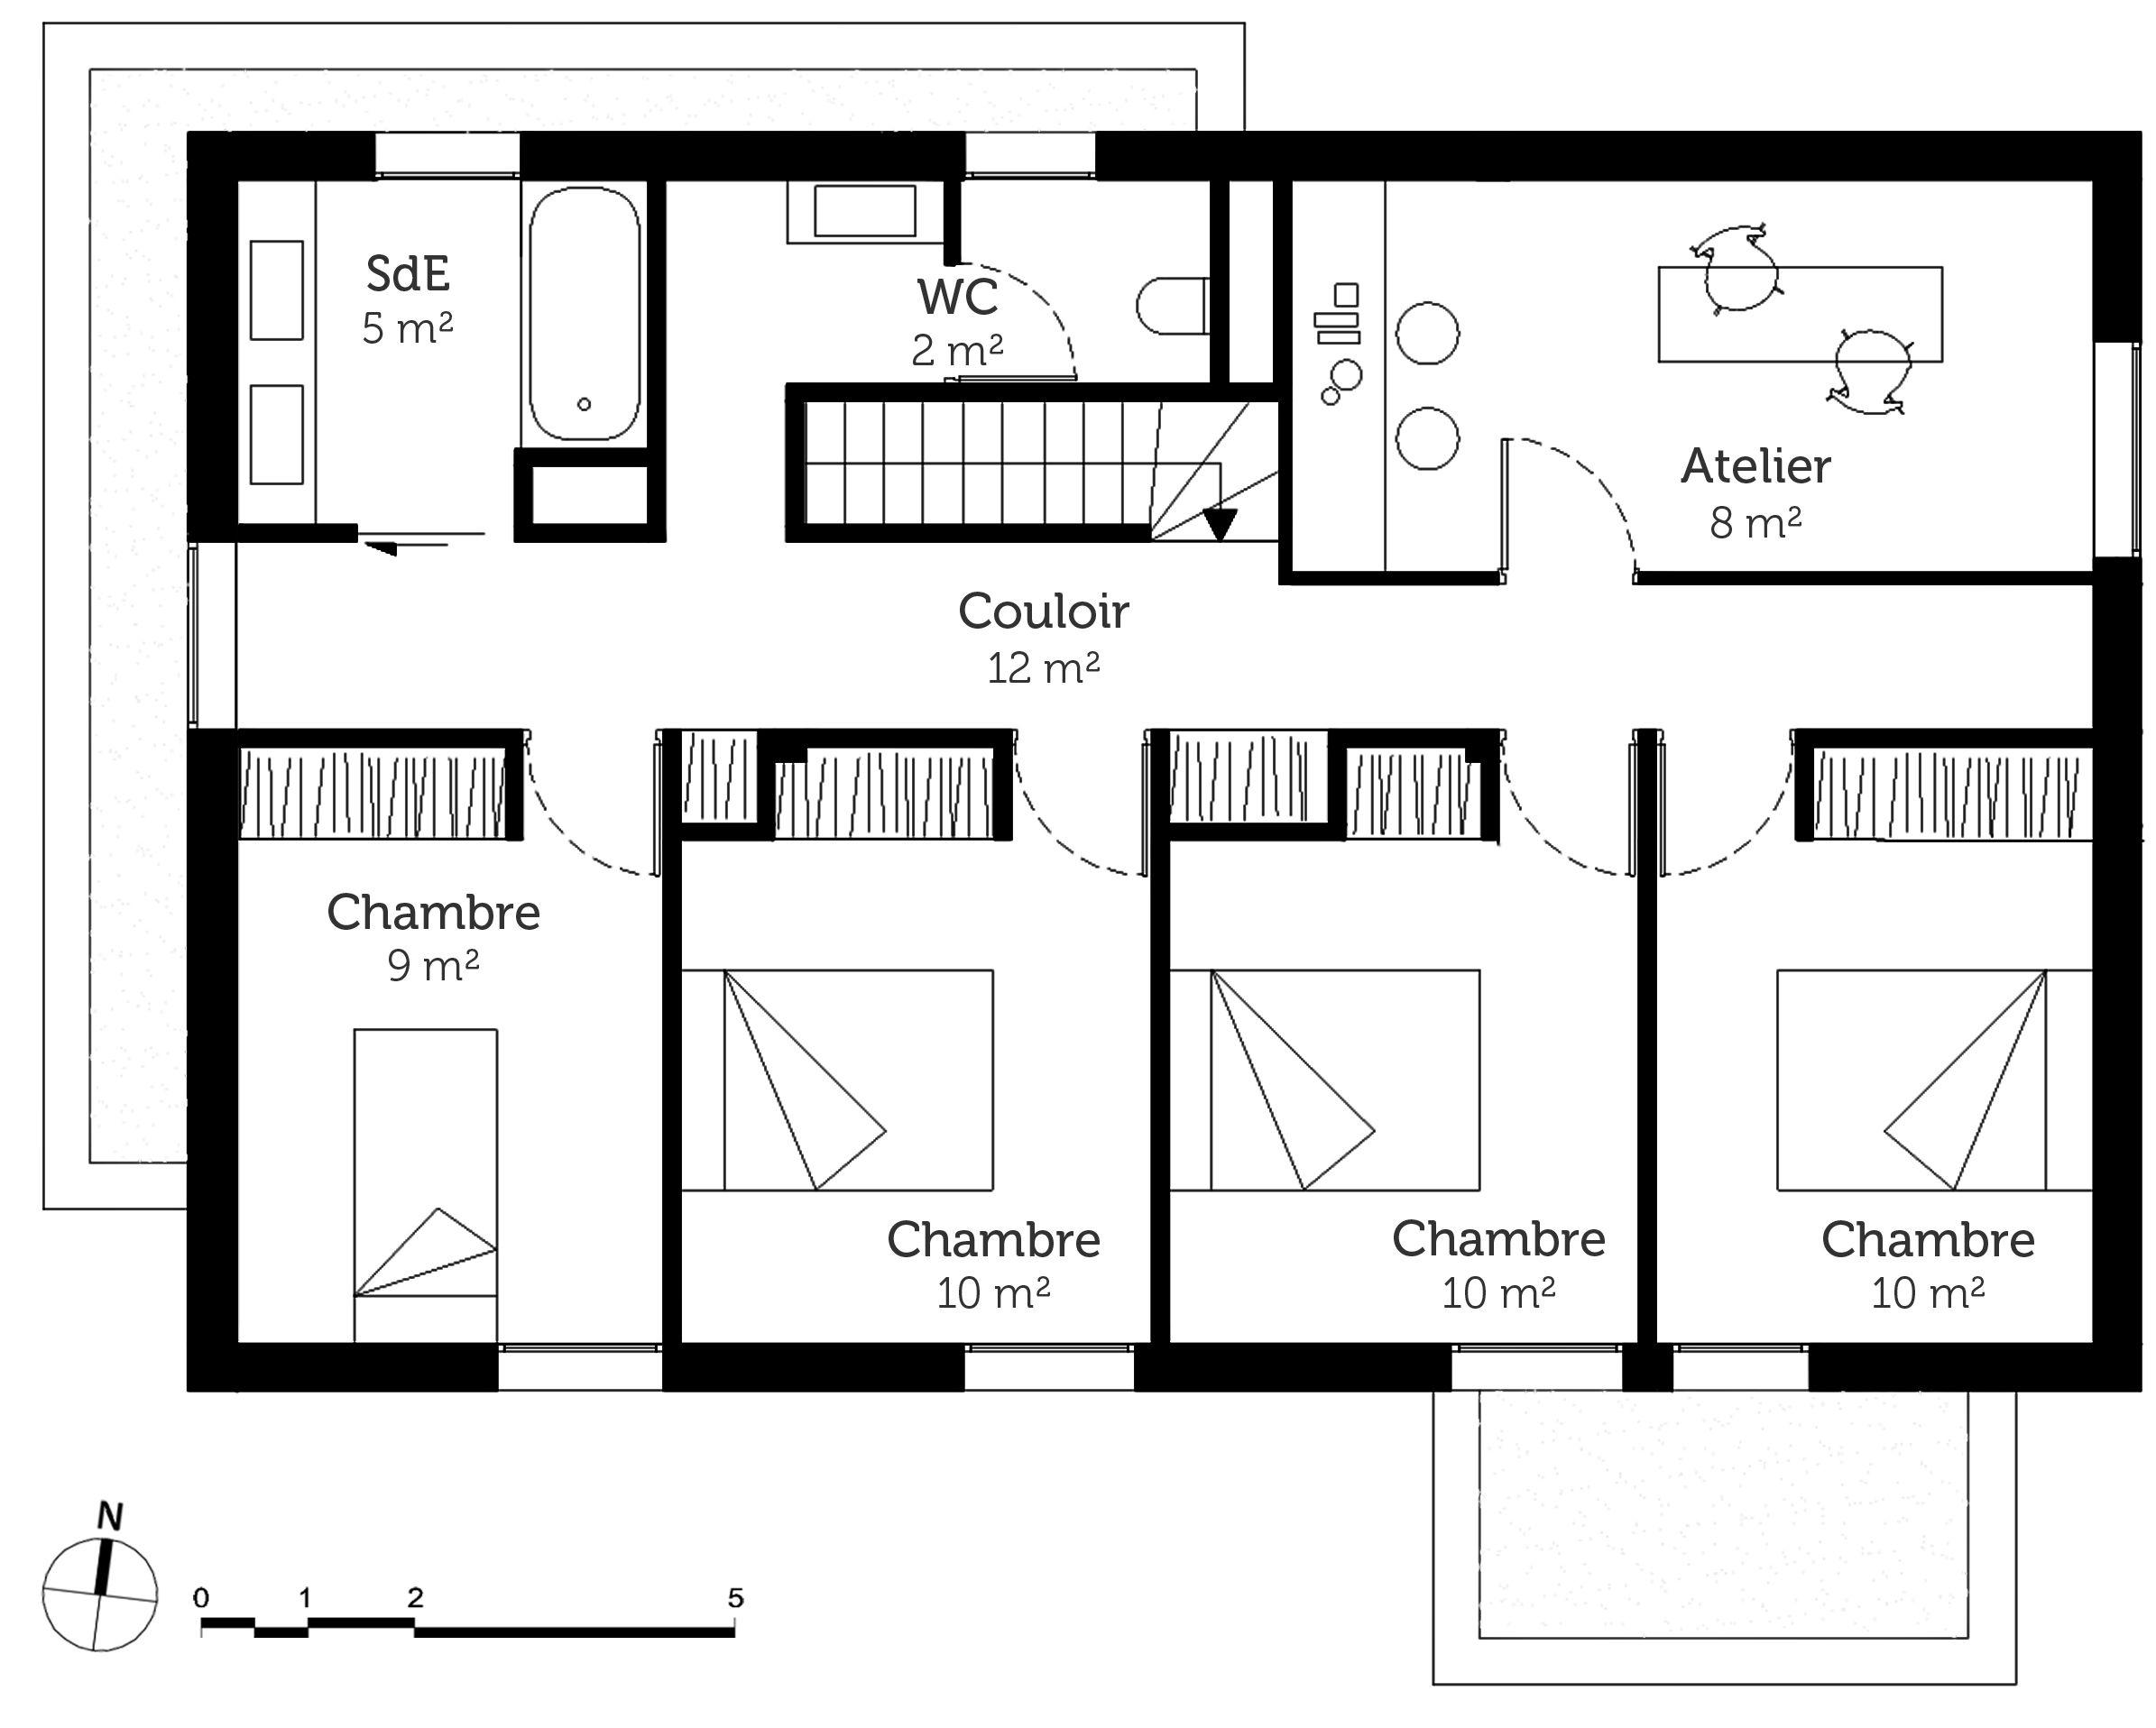 Plan Maison Plain Pied 4 Chambres En L Plan Maison Plain Pied Plan Maison Plan Maison 4 Chambres